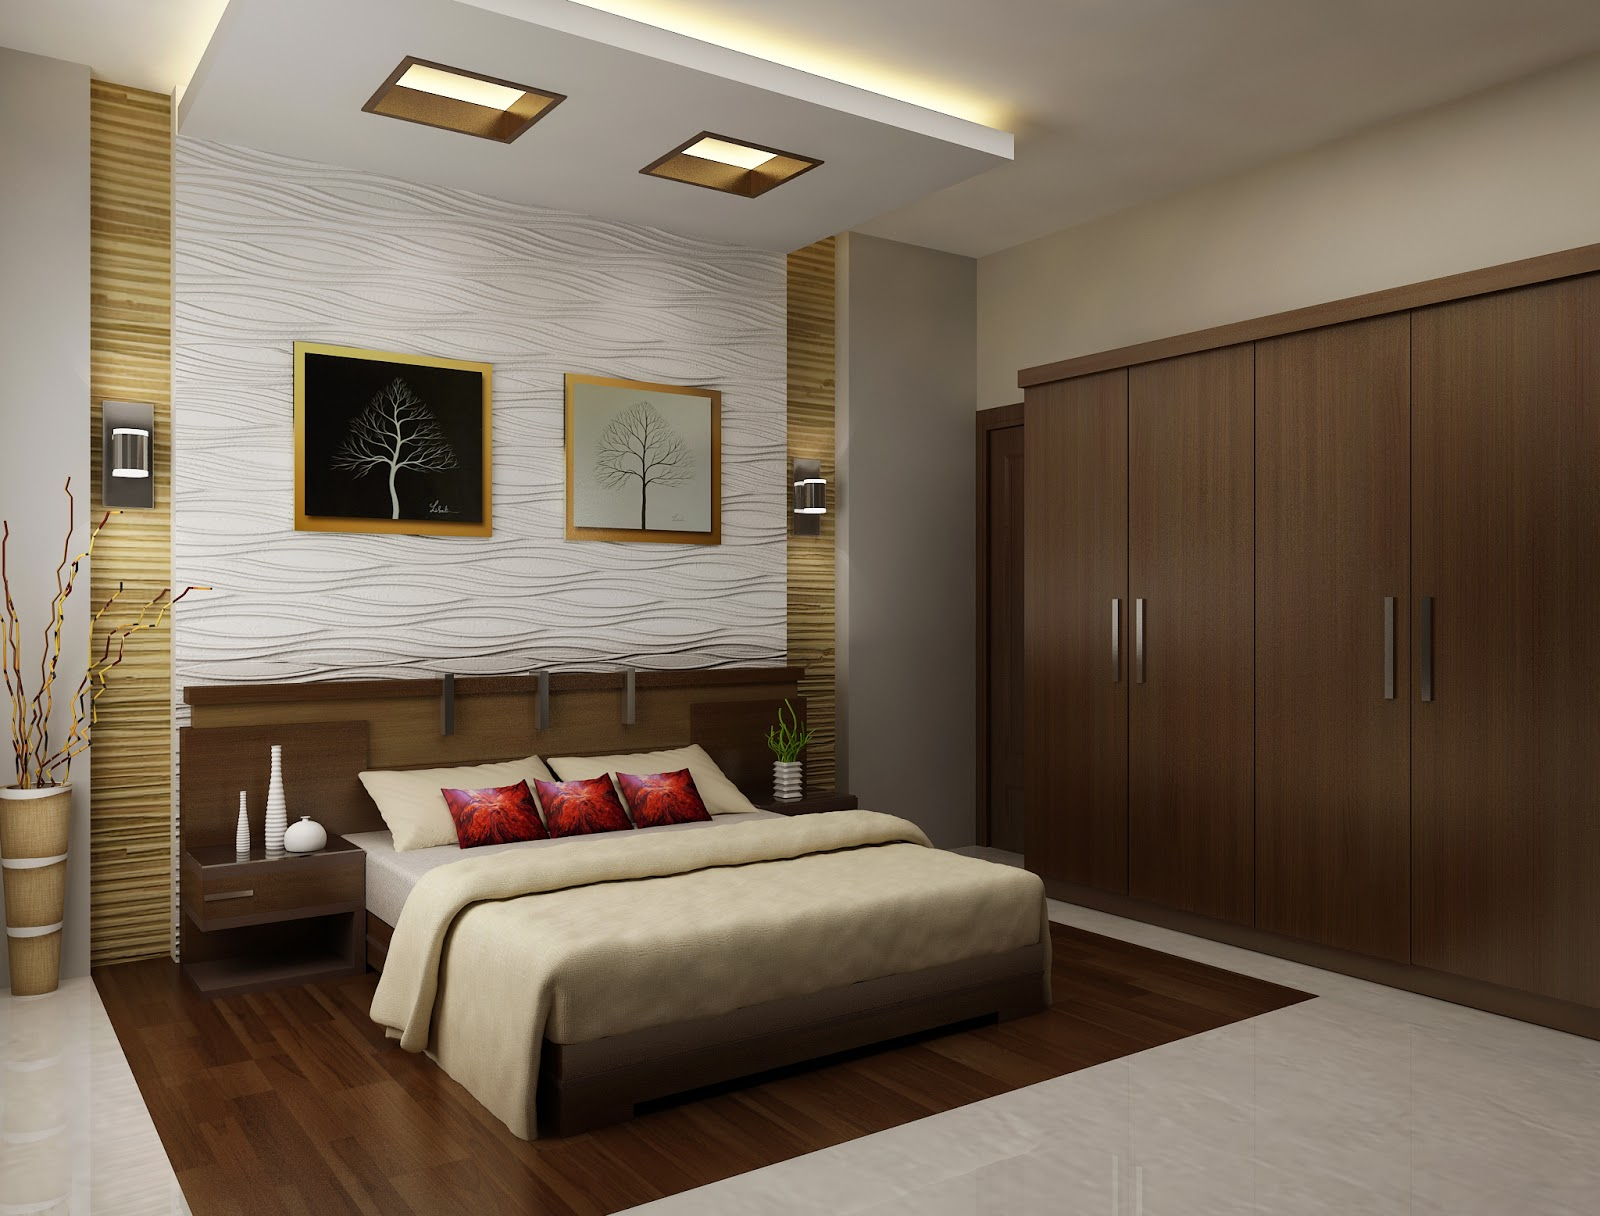 Small bedroom interior design ideas - Small Bedroom Furniture Luxurious Home Design